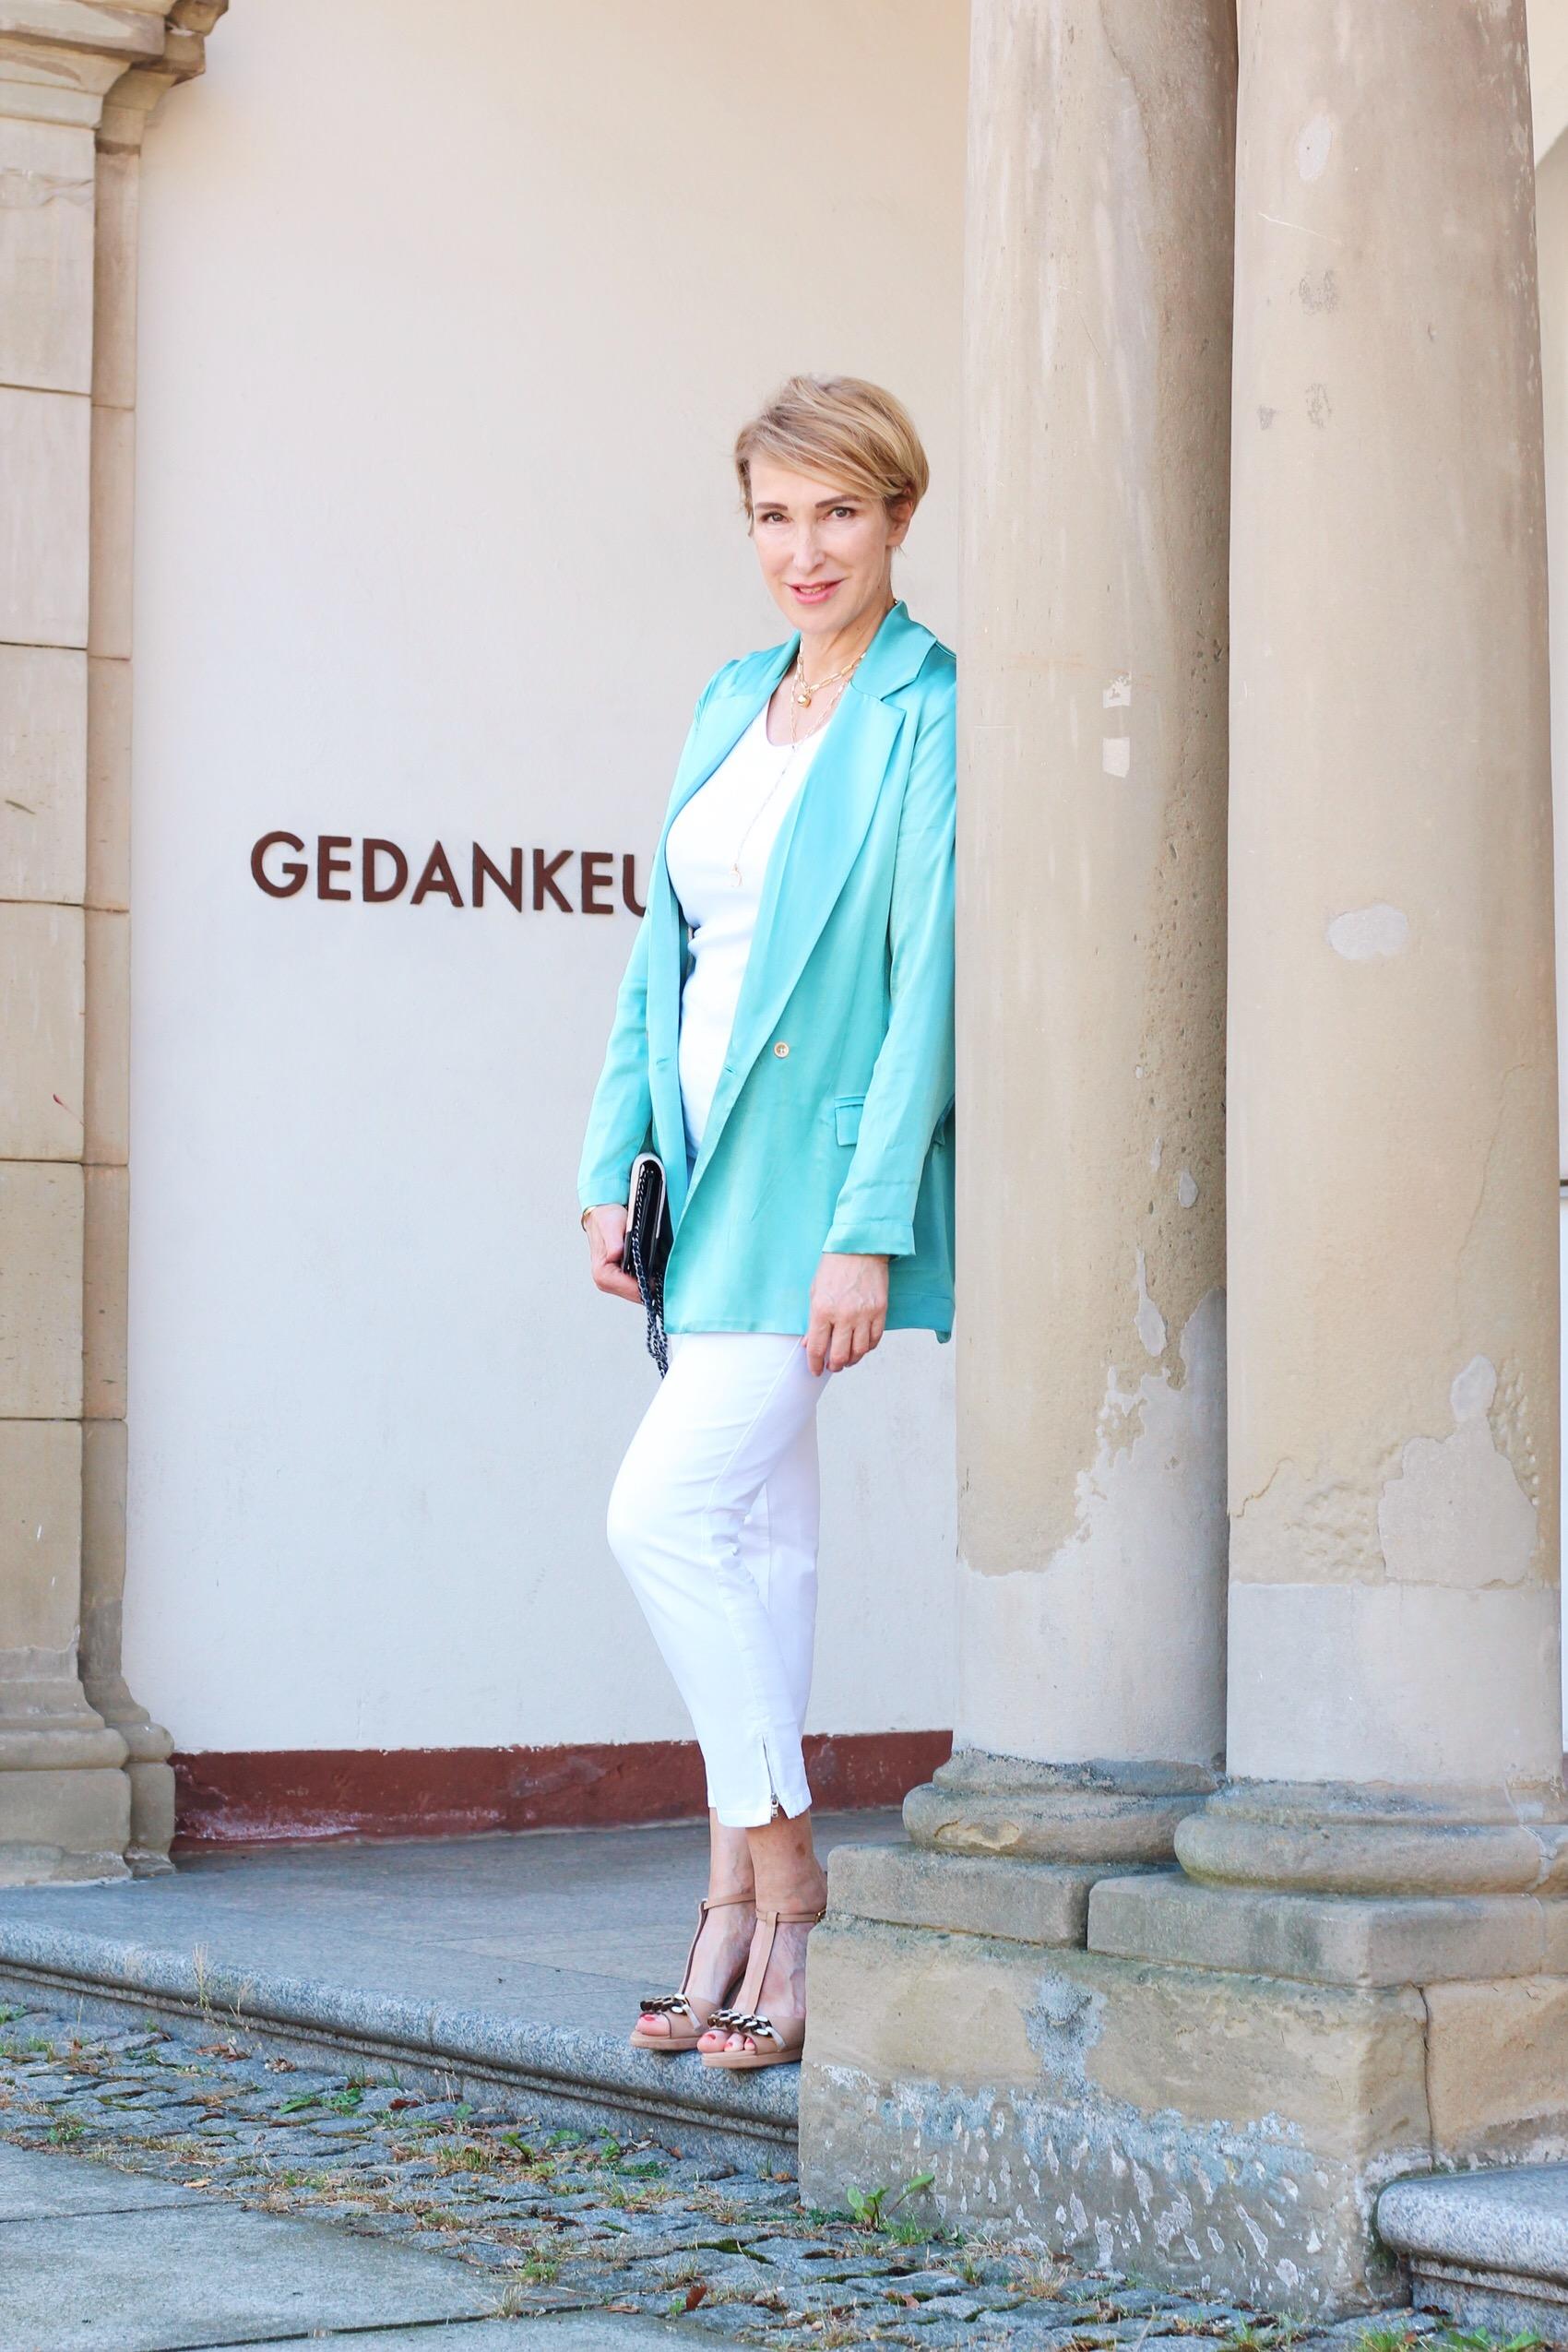 glamupyourlifestyle türkis make-up sommr-glow bild-derfrau ü-40-blog ue-50-blog ue-50-mode ü-40-mode